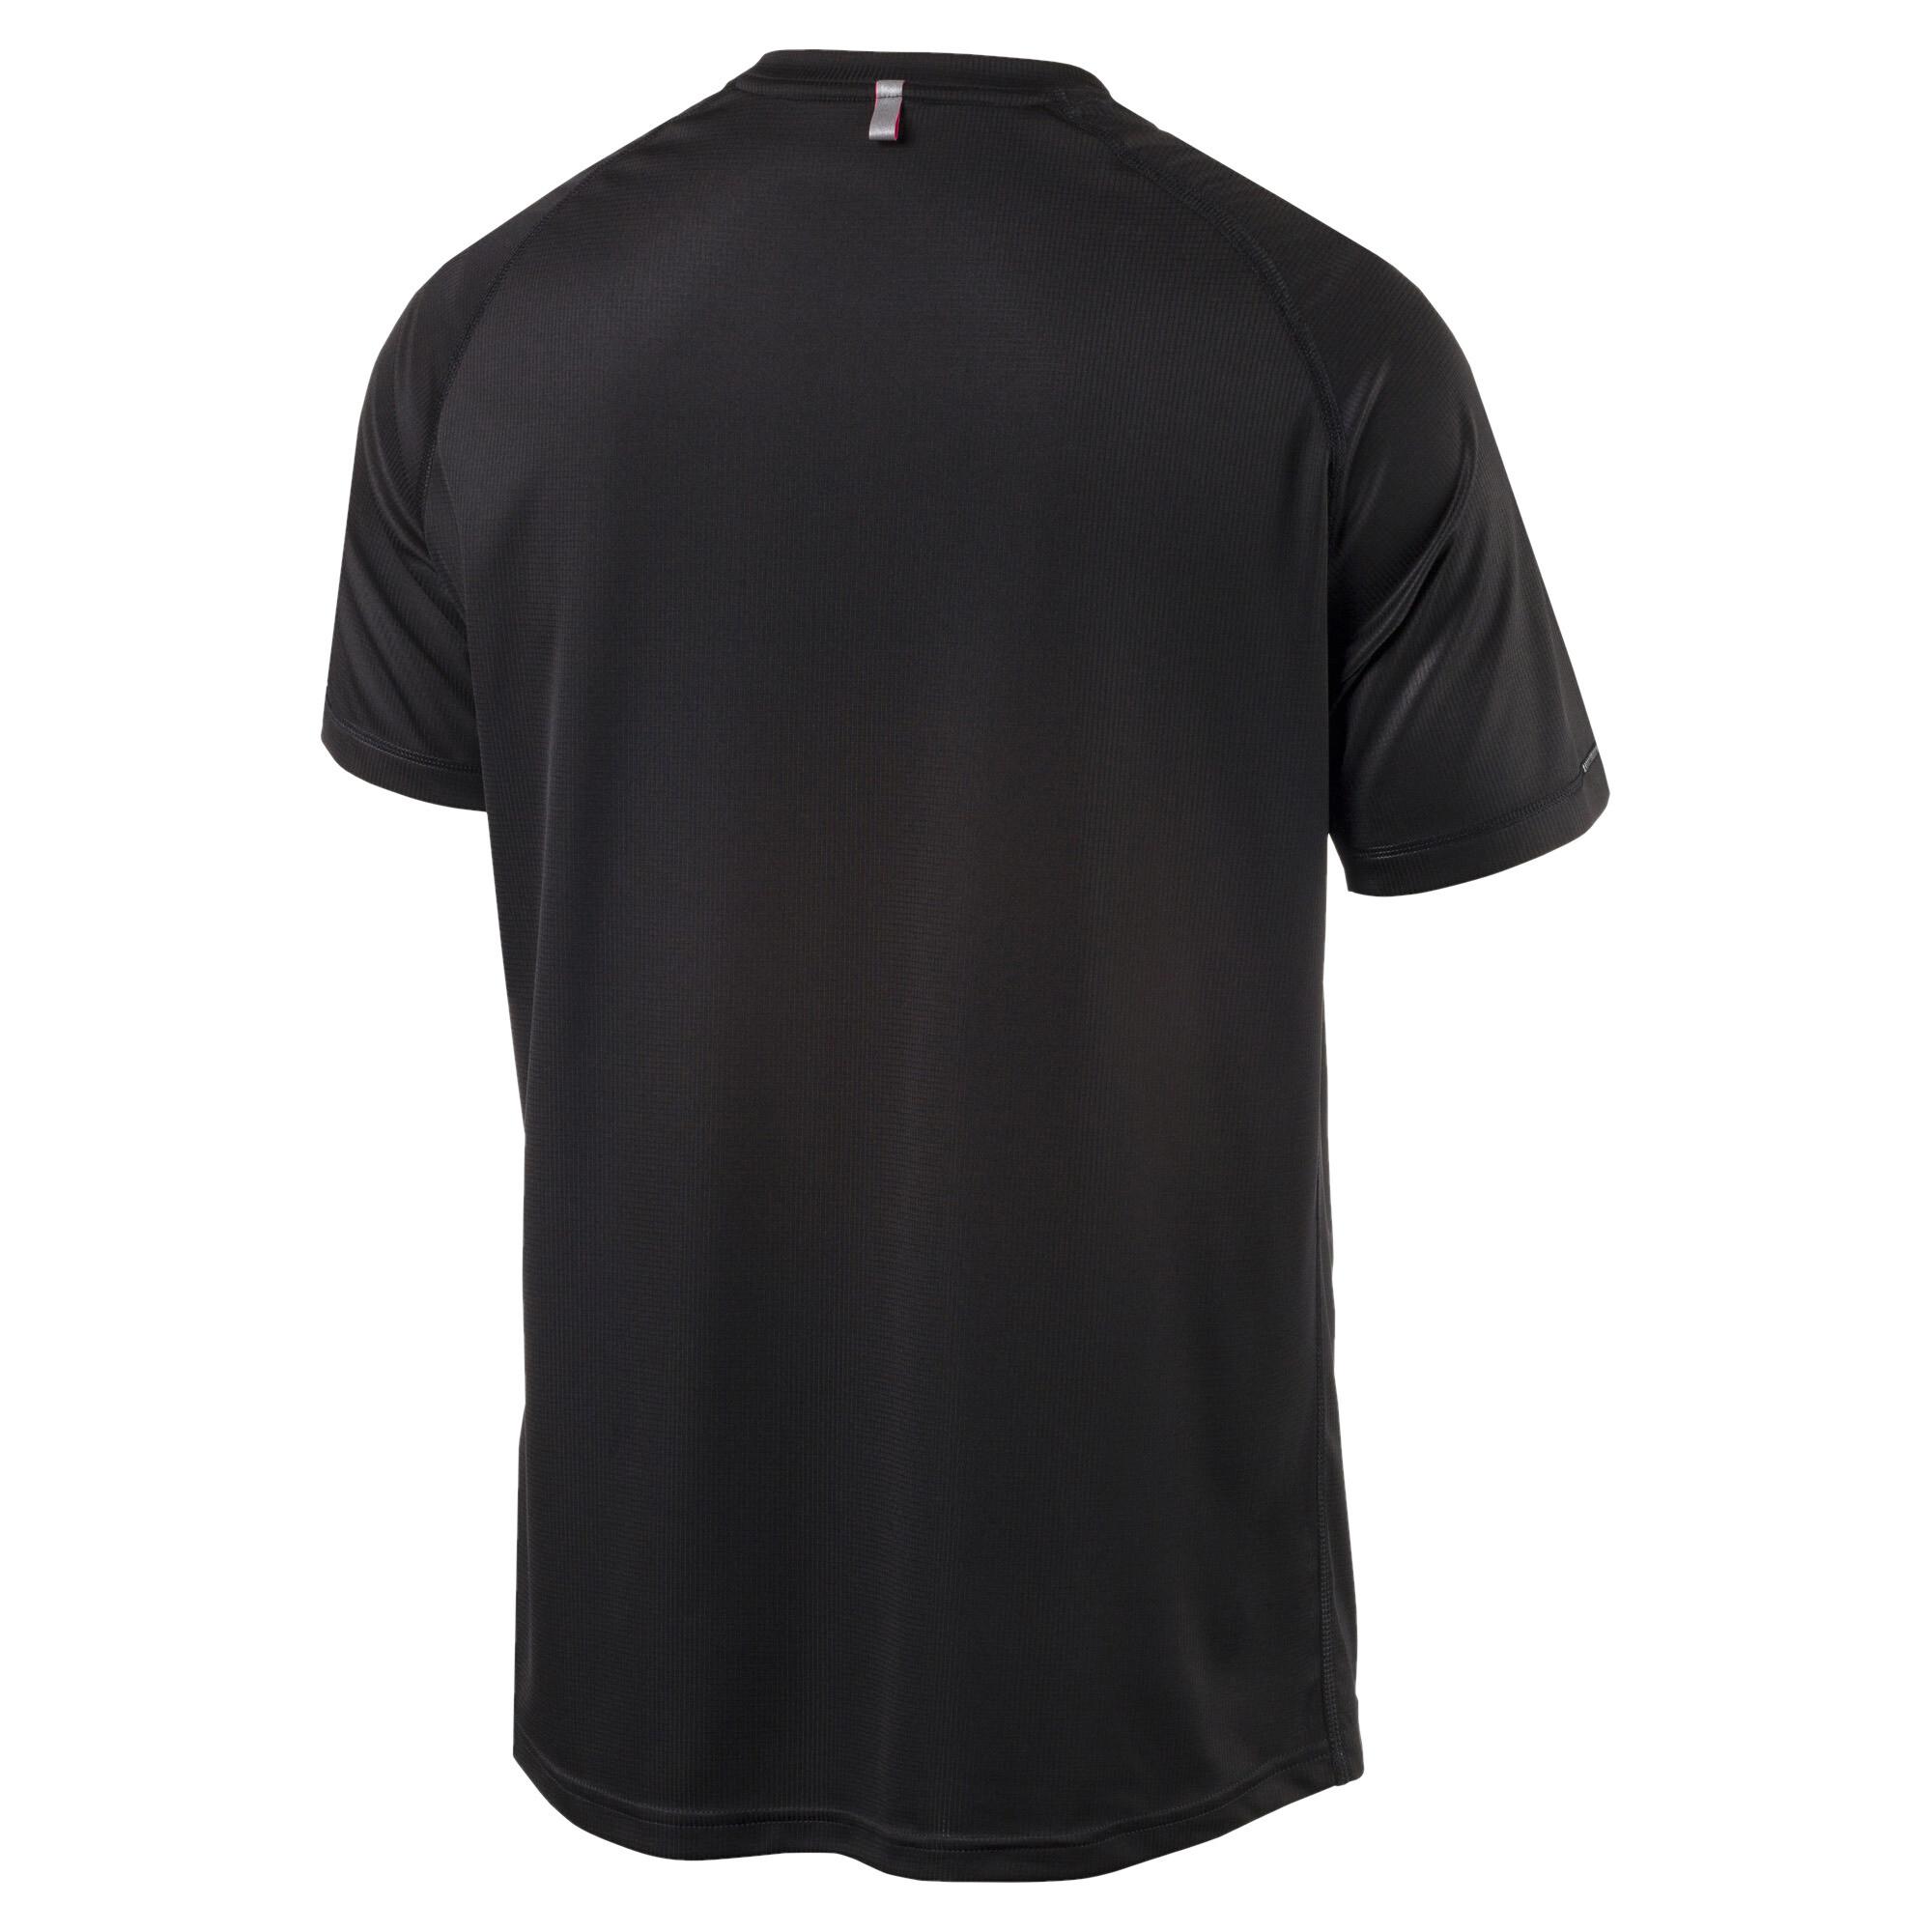 Indexbild 3 - PUMA Running Herren T-Shirt Männer T-Shirt Laufen Neu